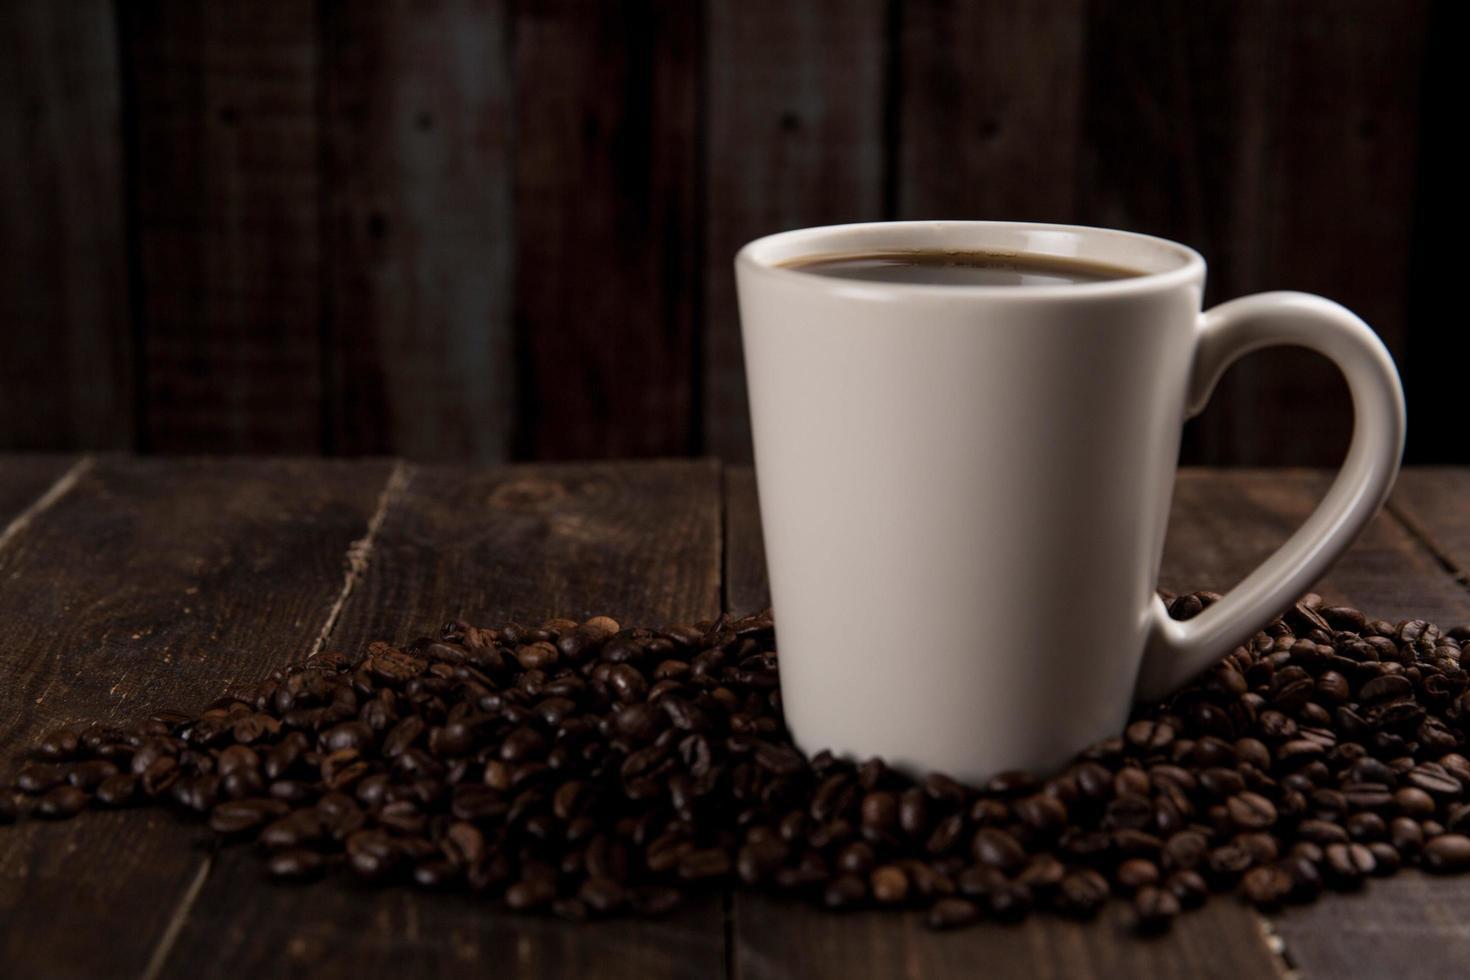 koffiemok op donkere achtergrond foto